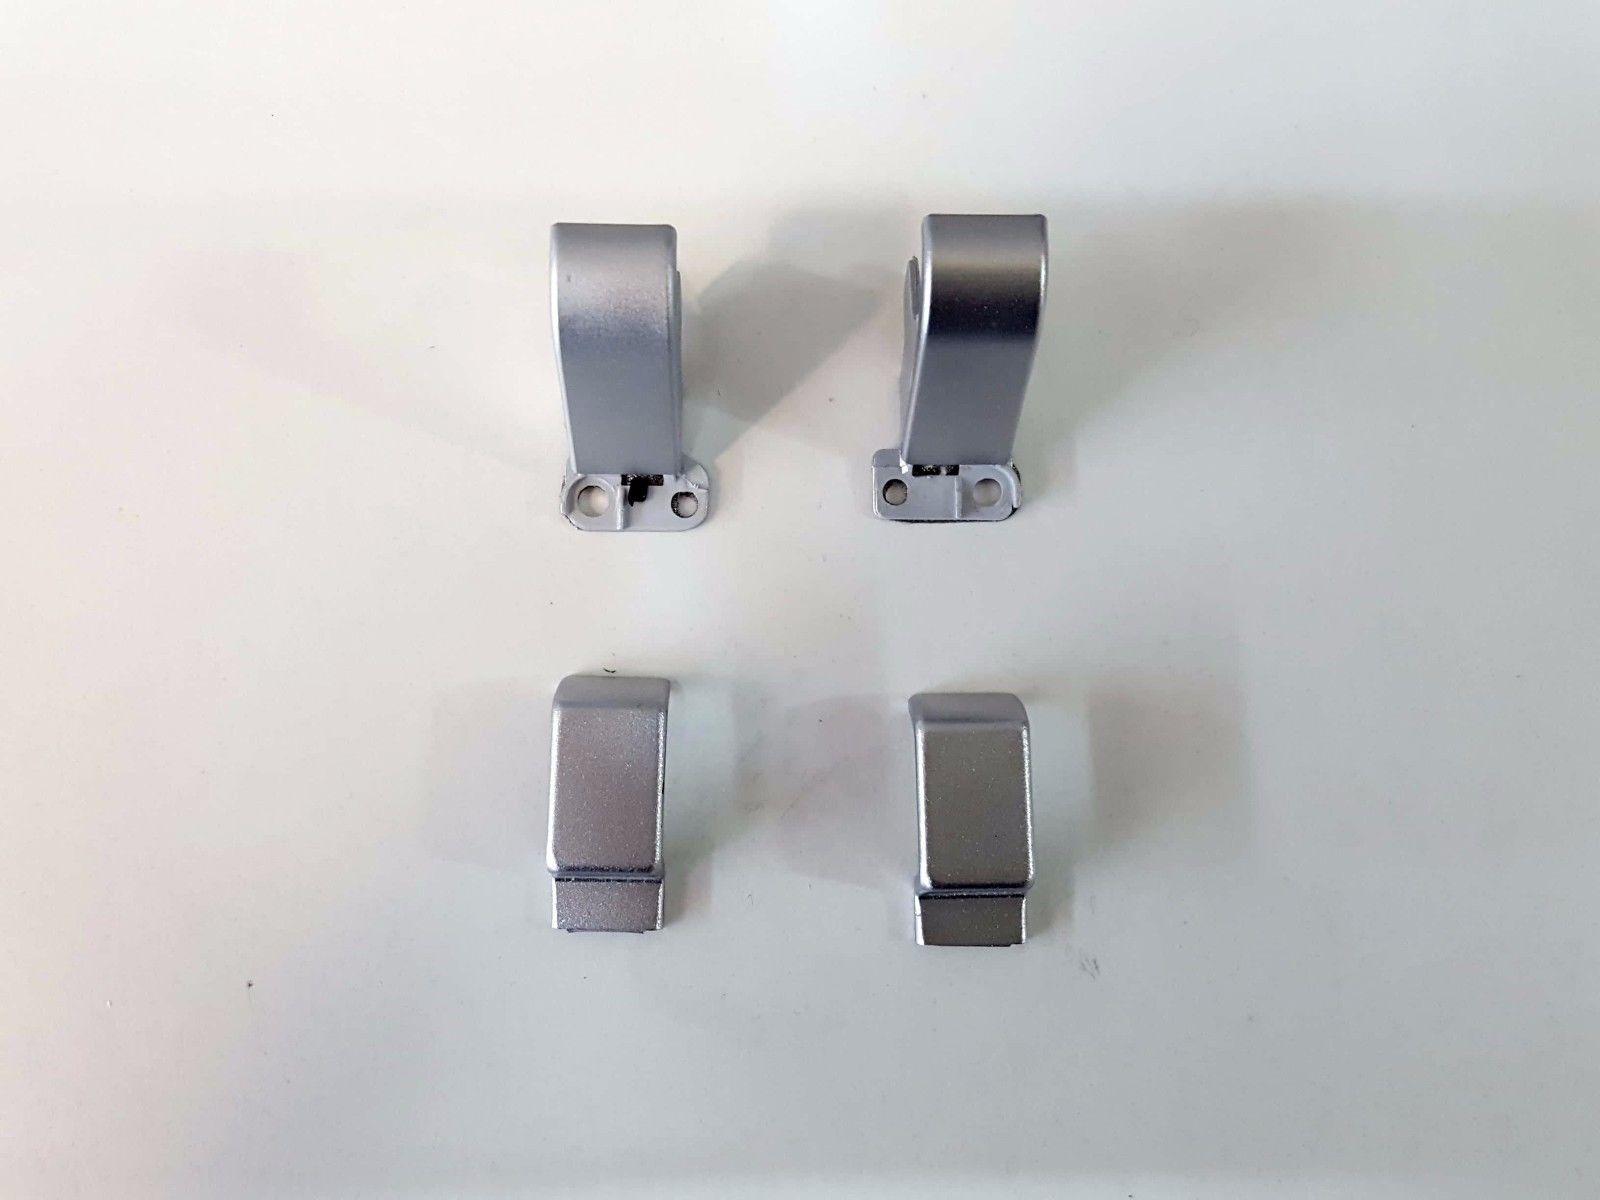 Chụp Bản Lề HP DV6-6000 - Hinges Plastic Covers